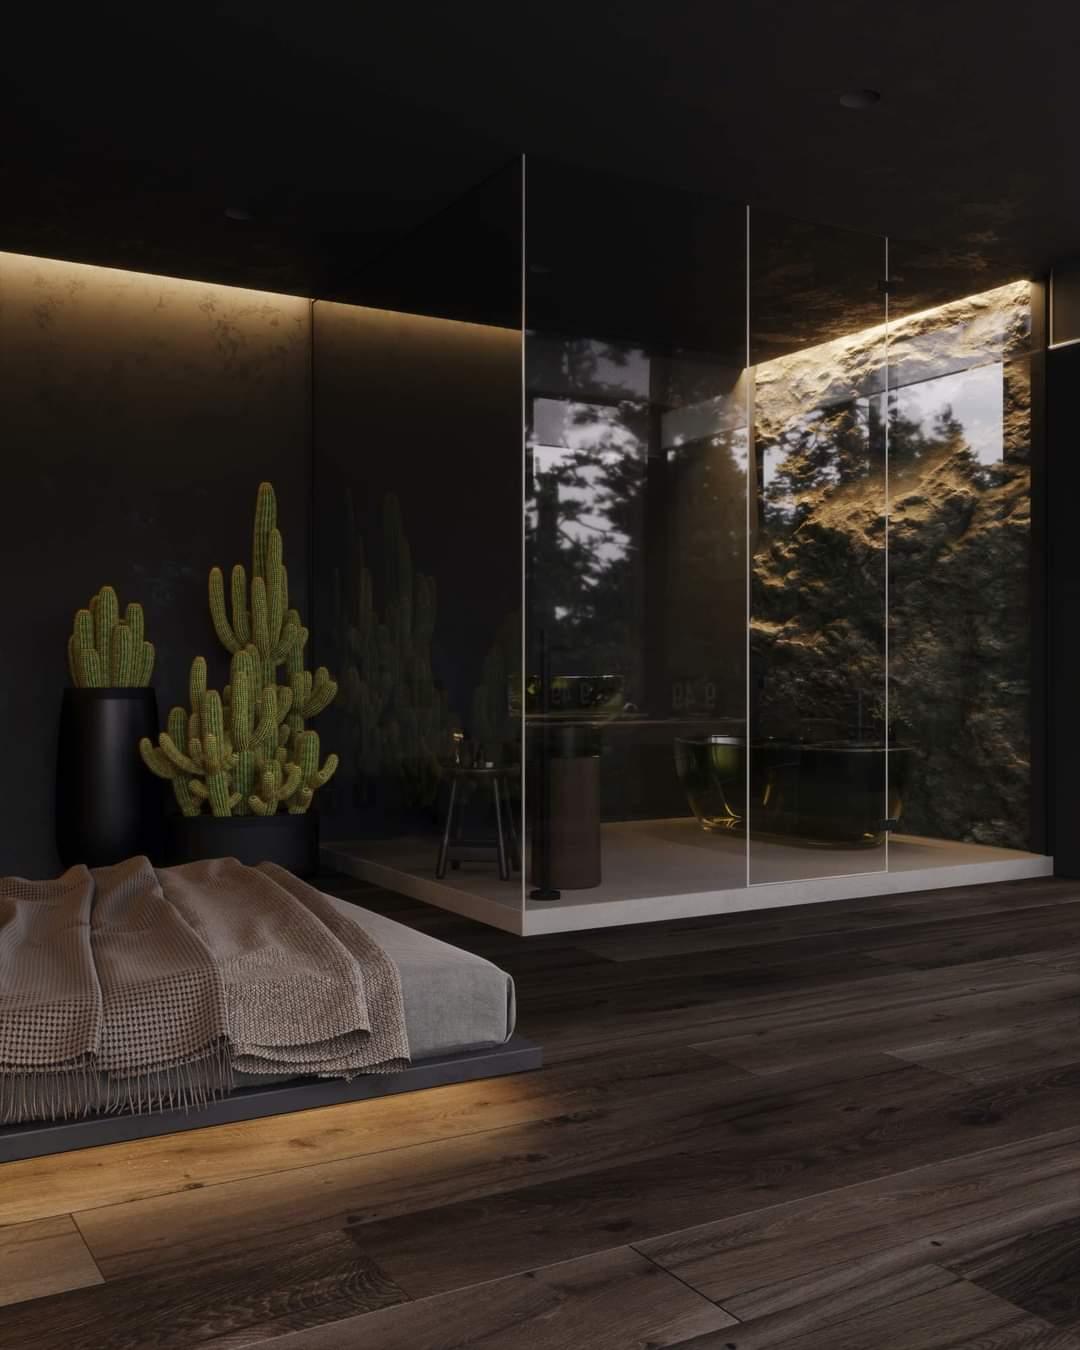 Striking Bathroom Interior Set Up - Source: Kireevaaanna